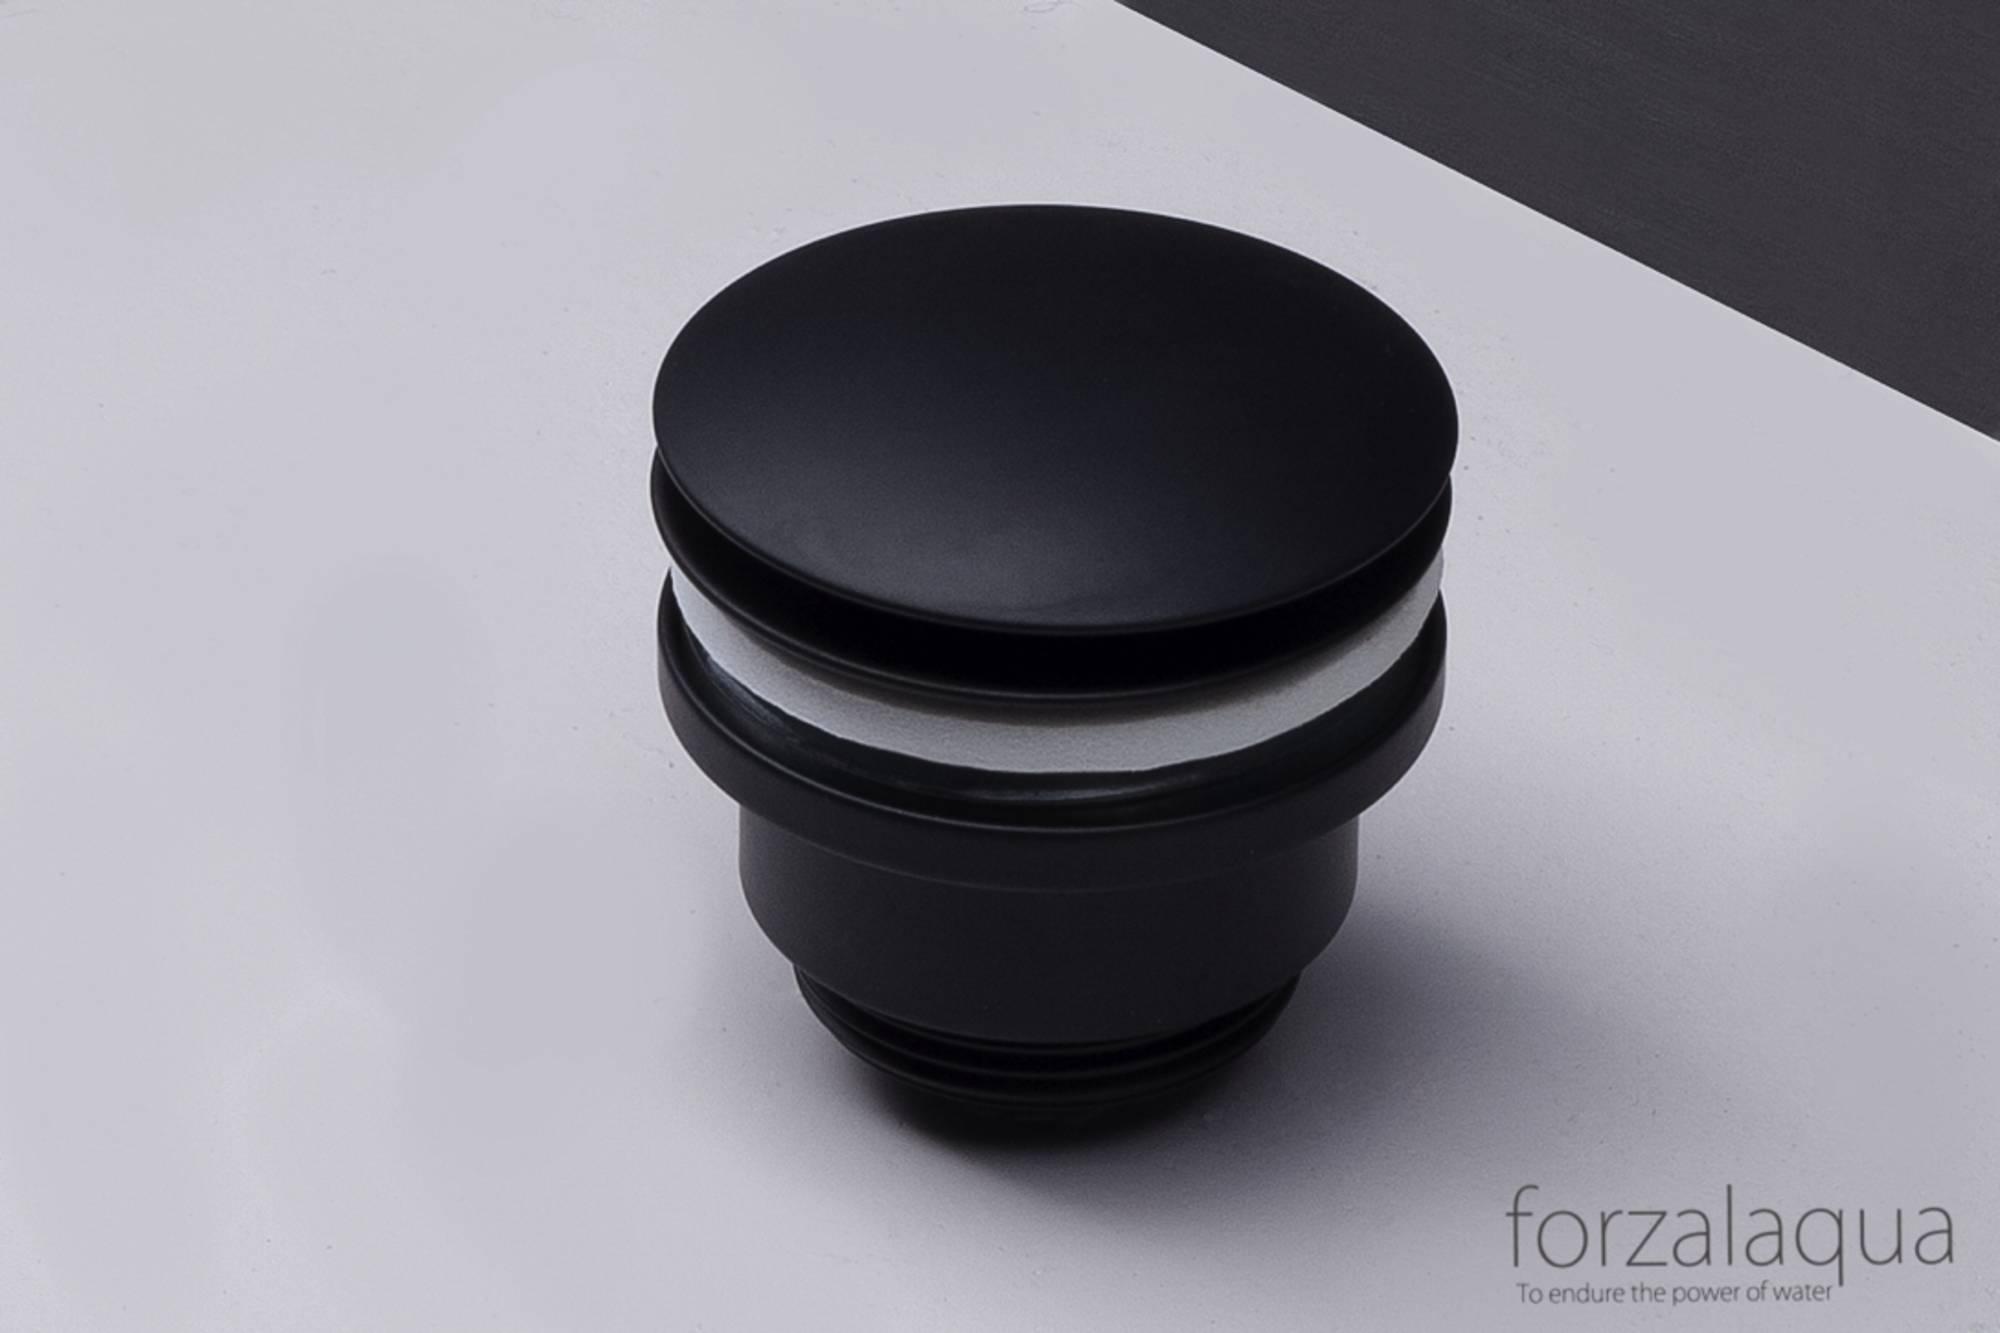 Forzalaqua Afvoerplug Chroom 5/4inch Push Open Zwart